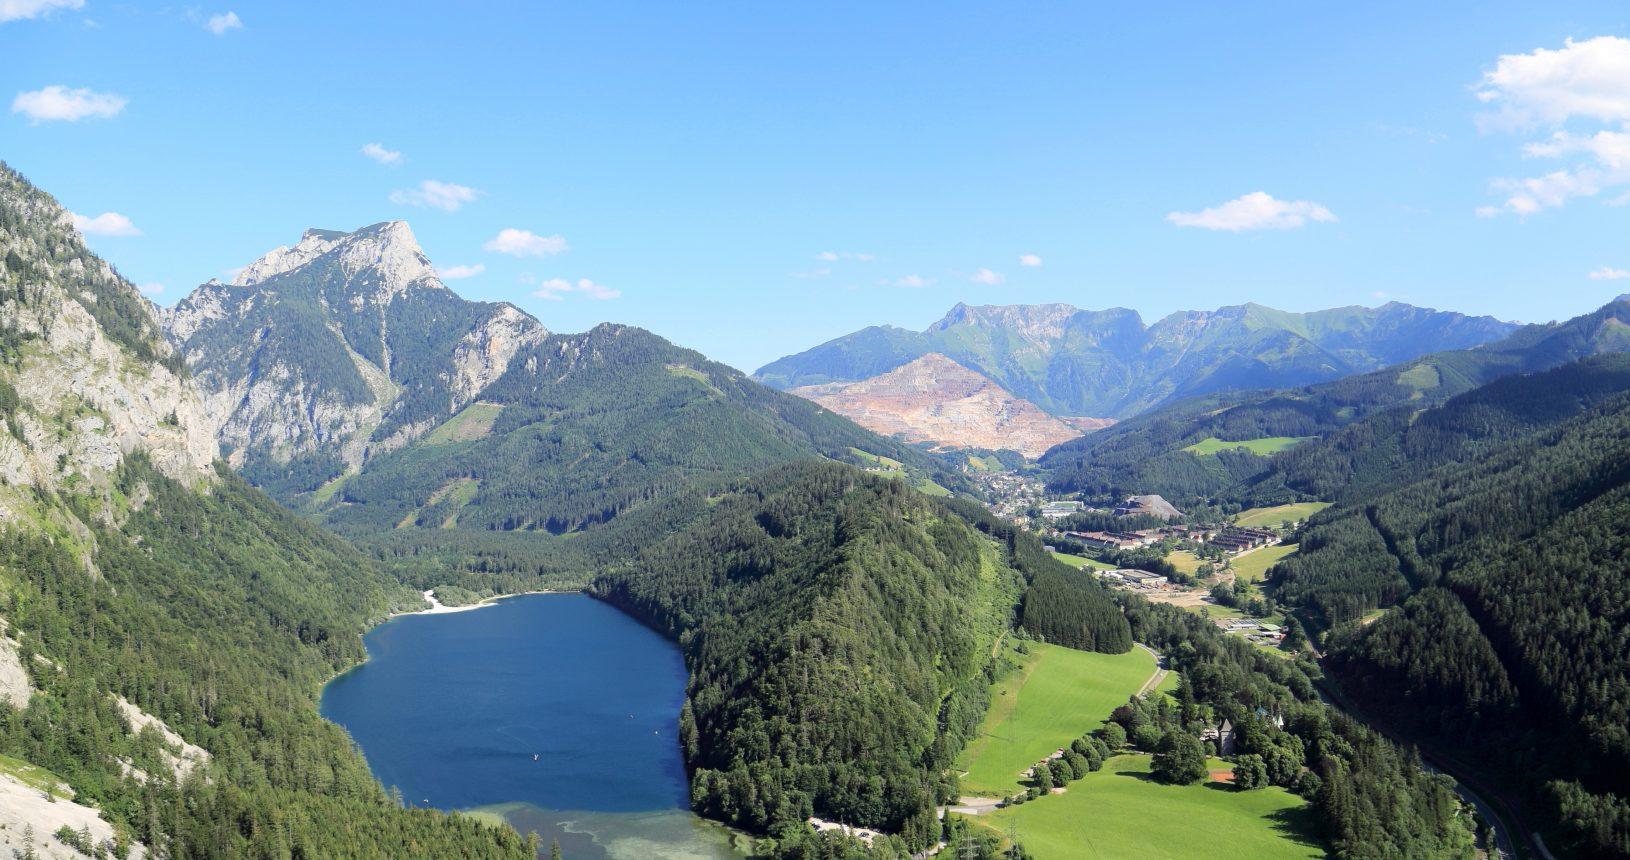 Alpesi szállás - www.alpesikaland.hu - Hotel-Banhof - Alpesi-gyalogtúrák14